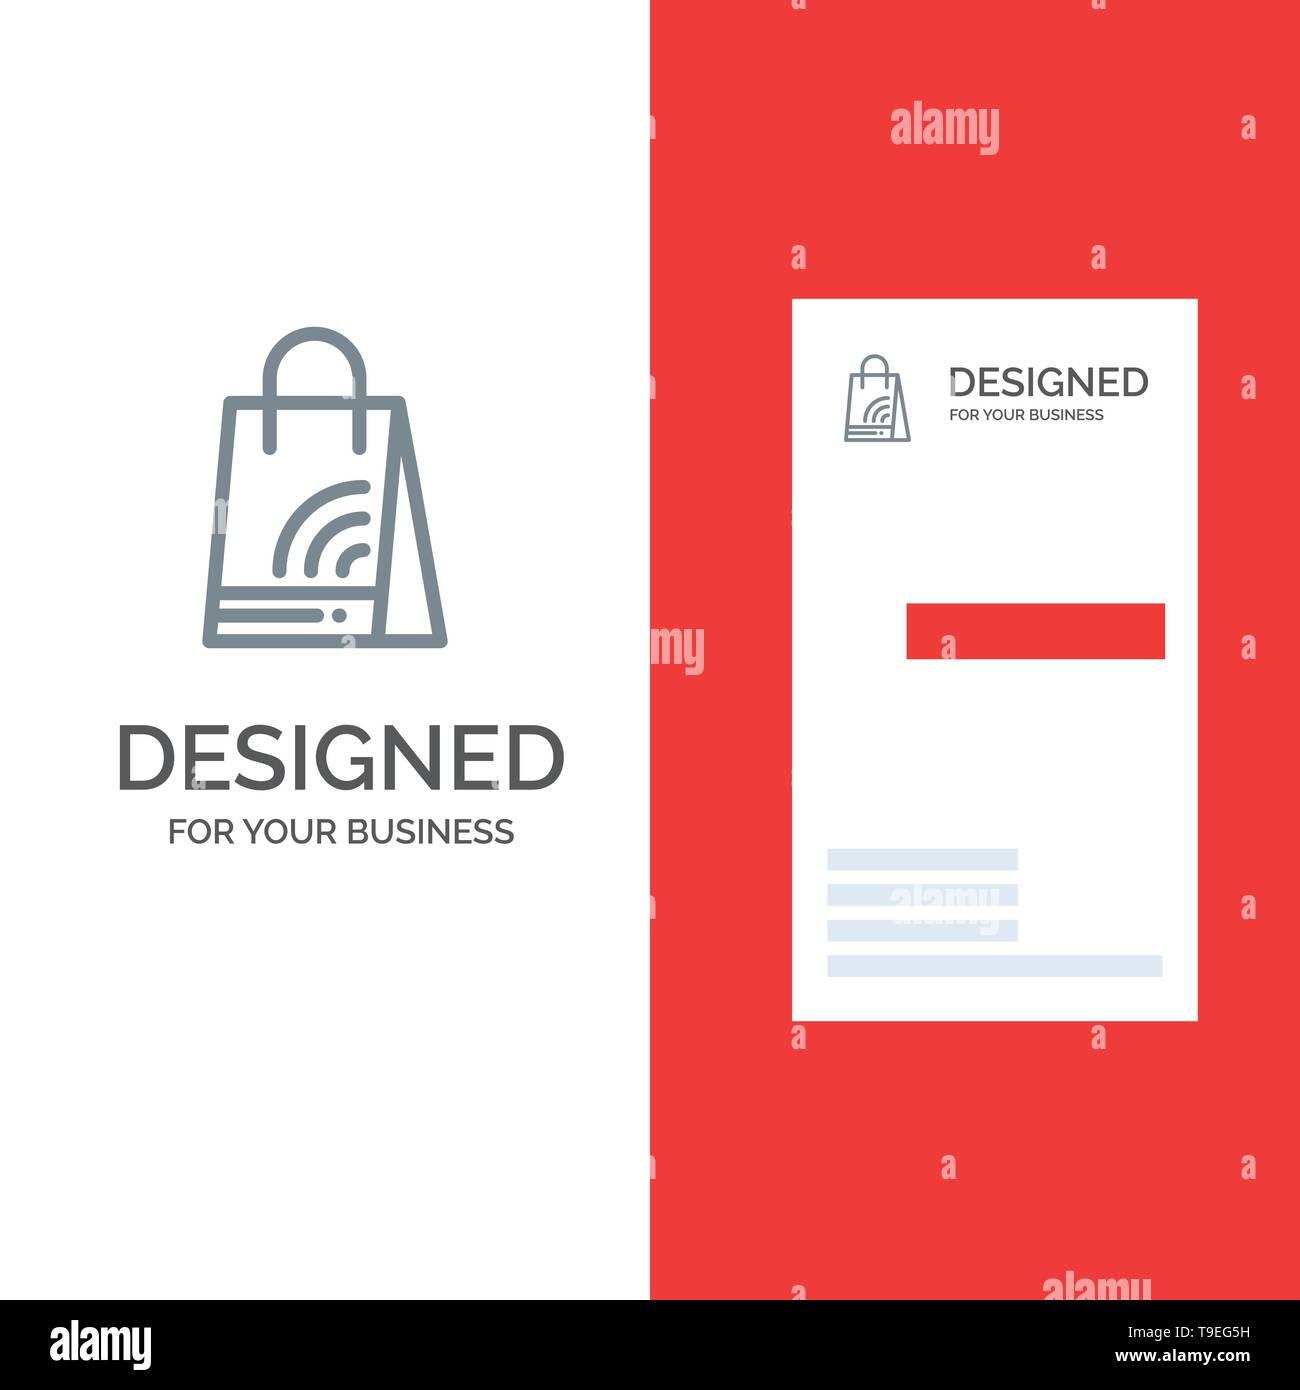 Bag, Handbag, Wifi, Shopping Grey Logo Design and Business Card Template - Stock Image